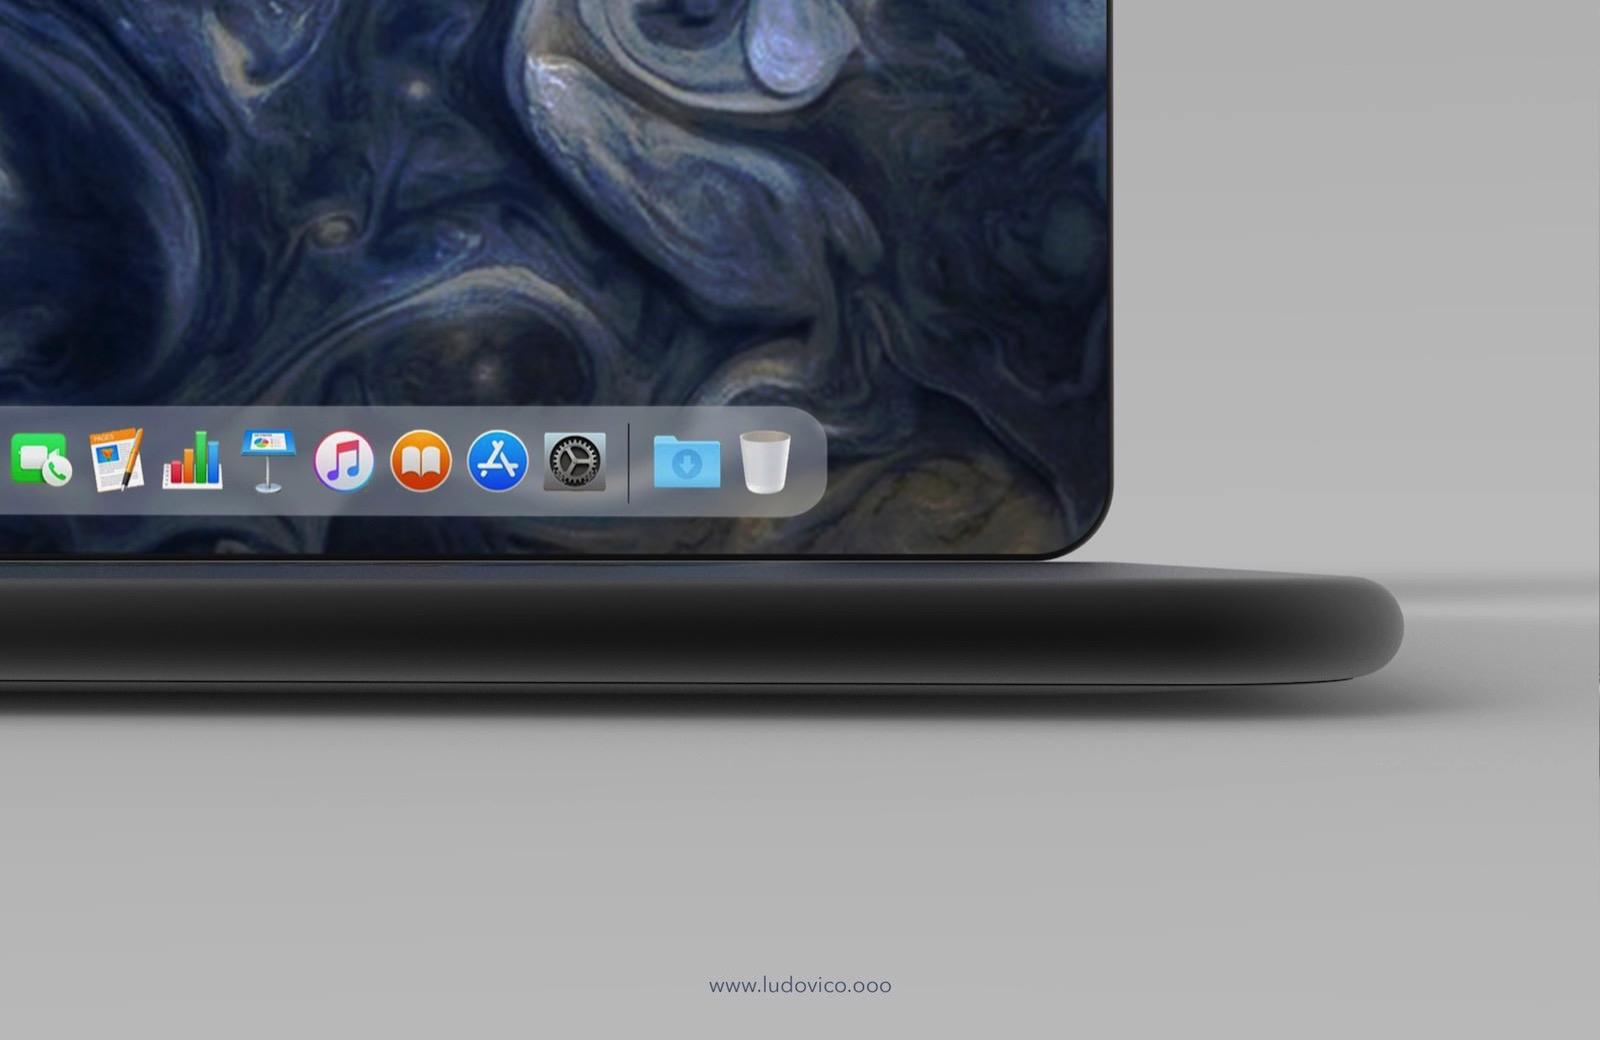 MacBook X Concept Image 4